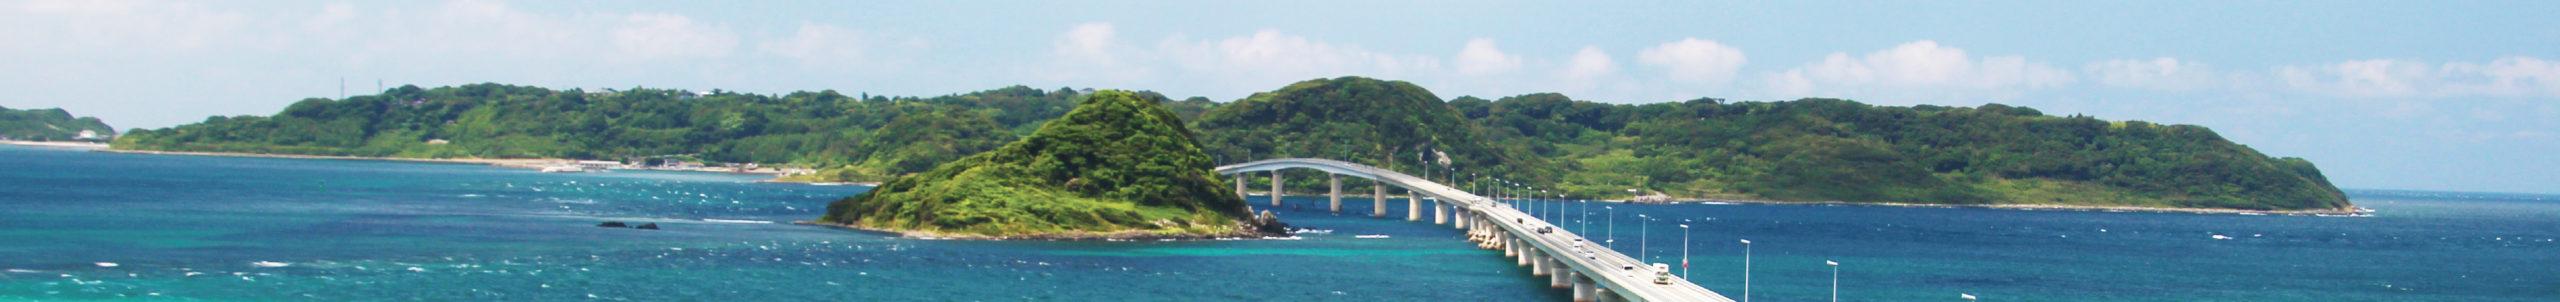 山口県 下関市 豊北町 特牛 角島 Kottoi Tsunashima